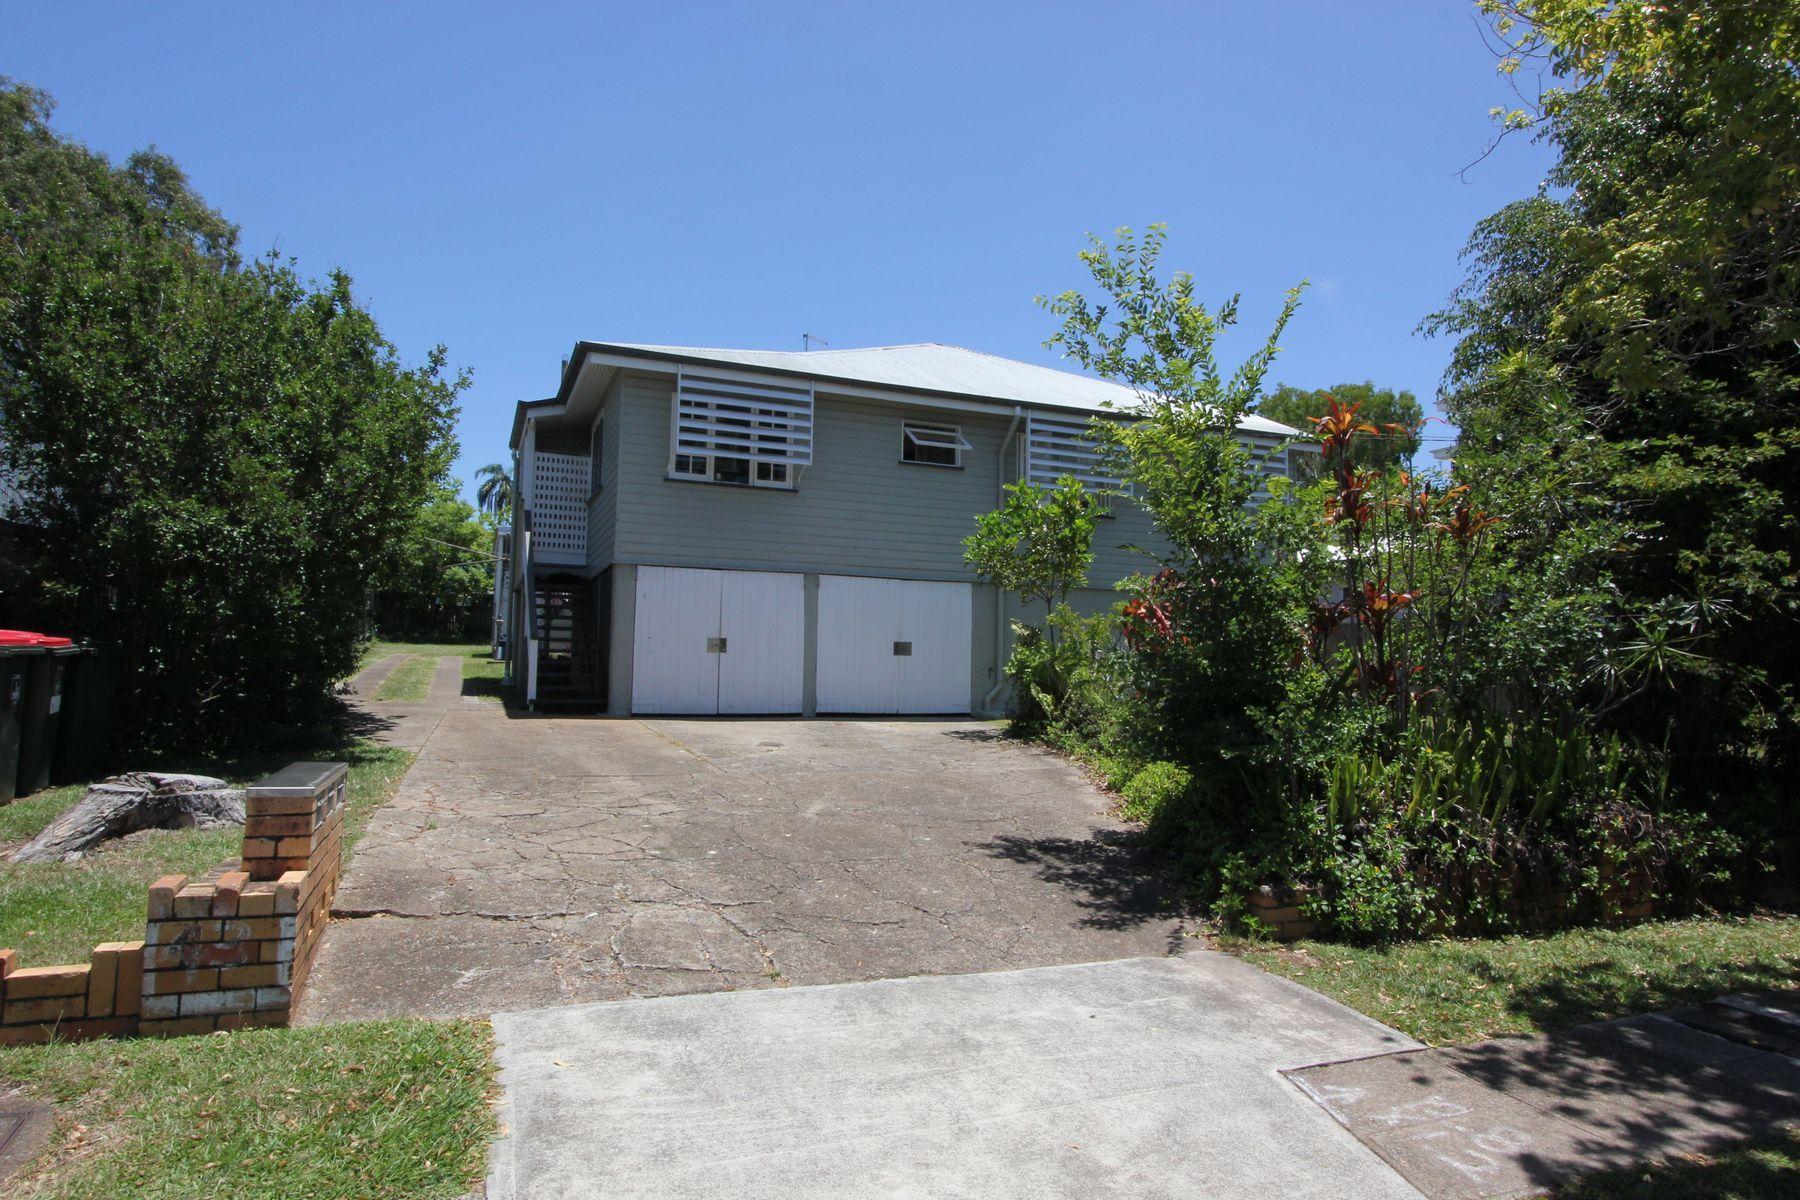 3/43 Primrose Street, Sherwood, QLD 4075